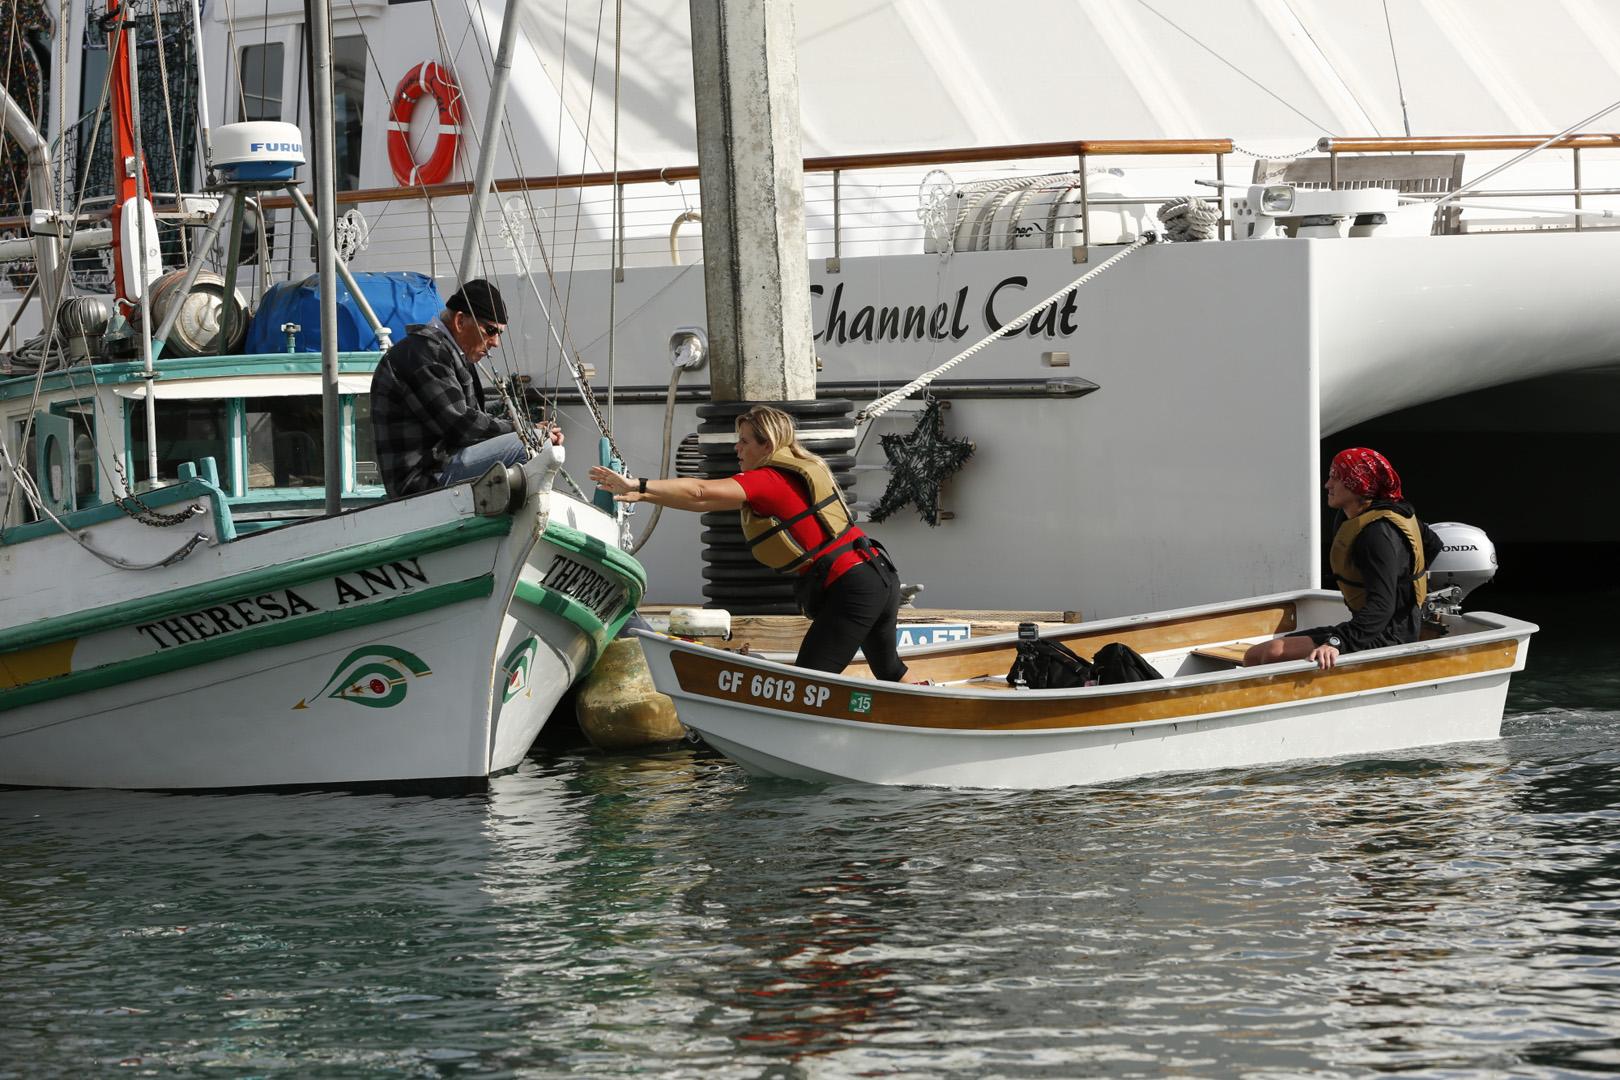 Sheri and Cole search Santa Barbara Harbor for the